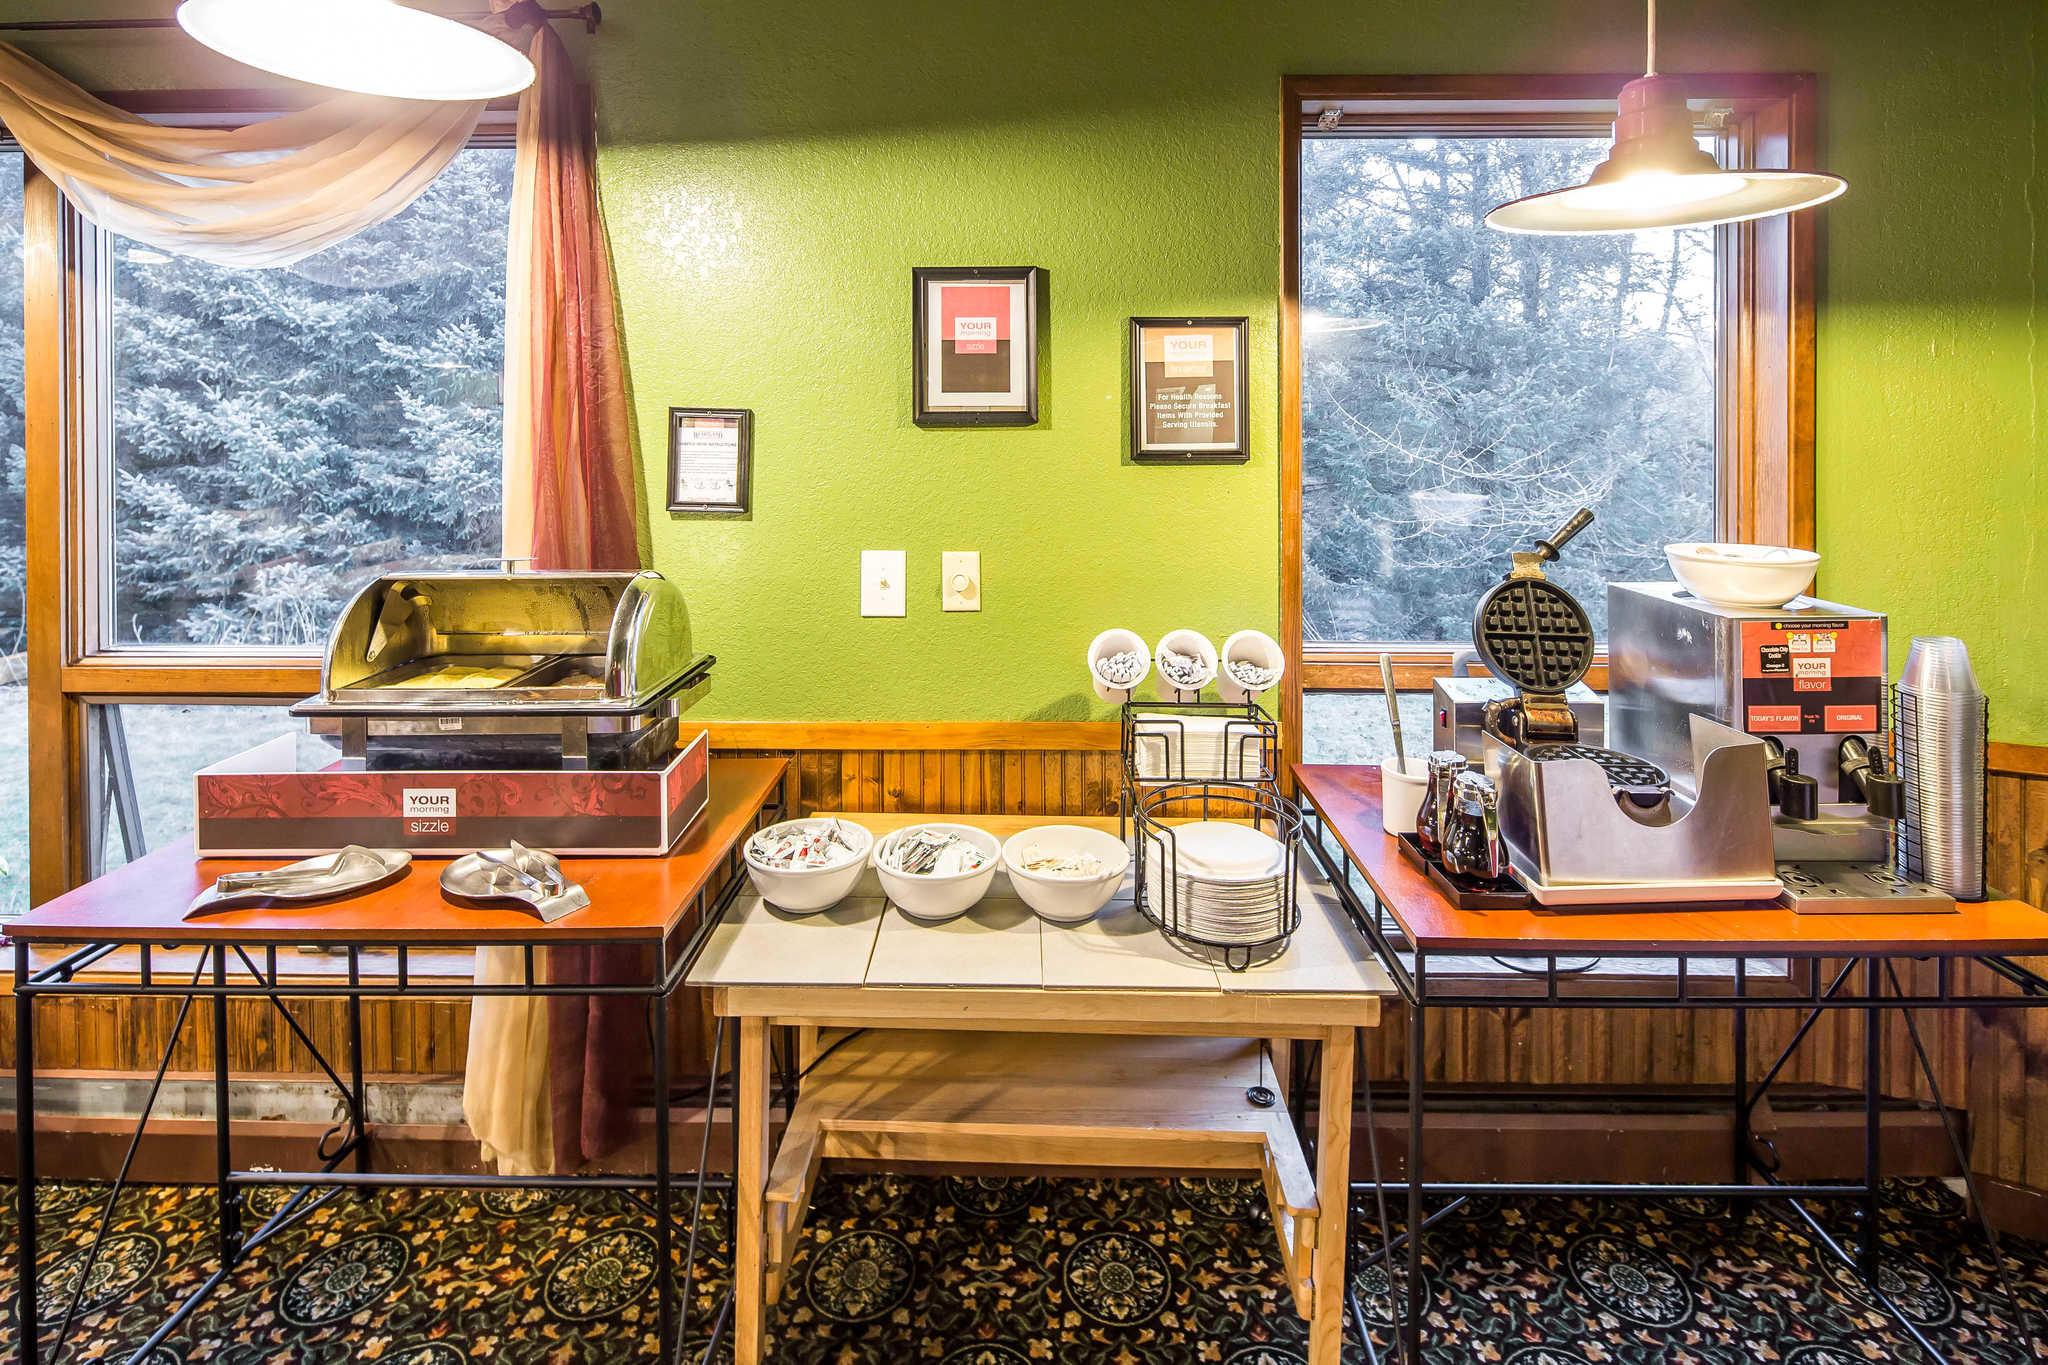 Comfort Inn, Kodiak Alaska (AK) - LocalDatabase.com